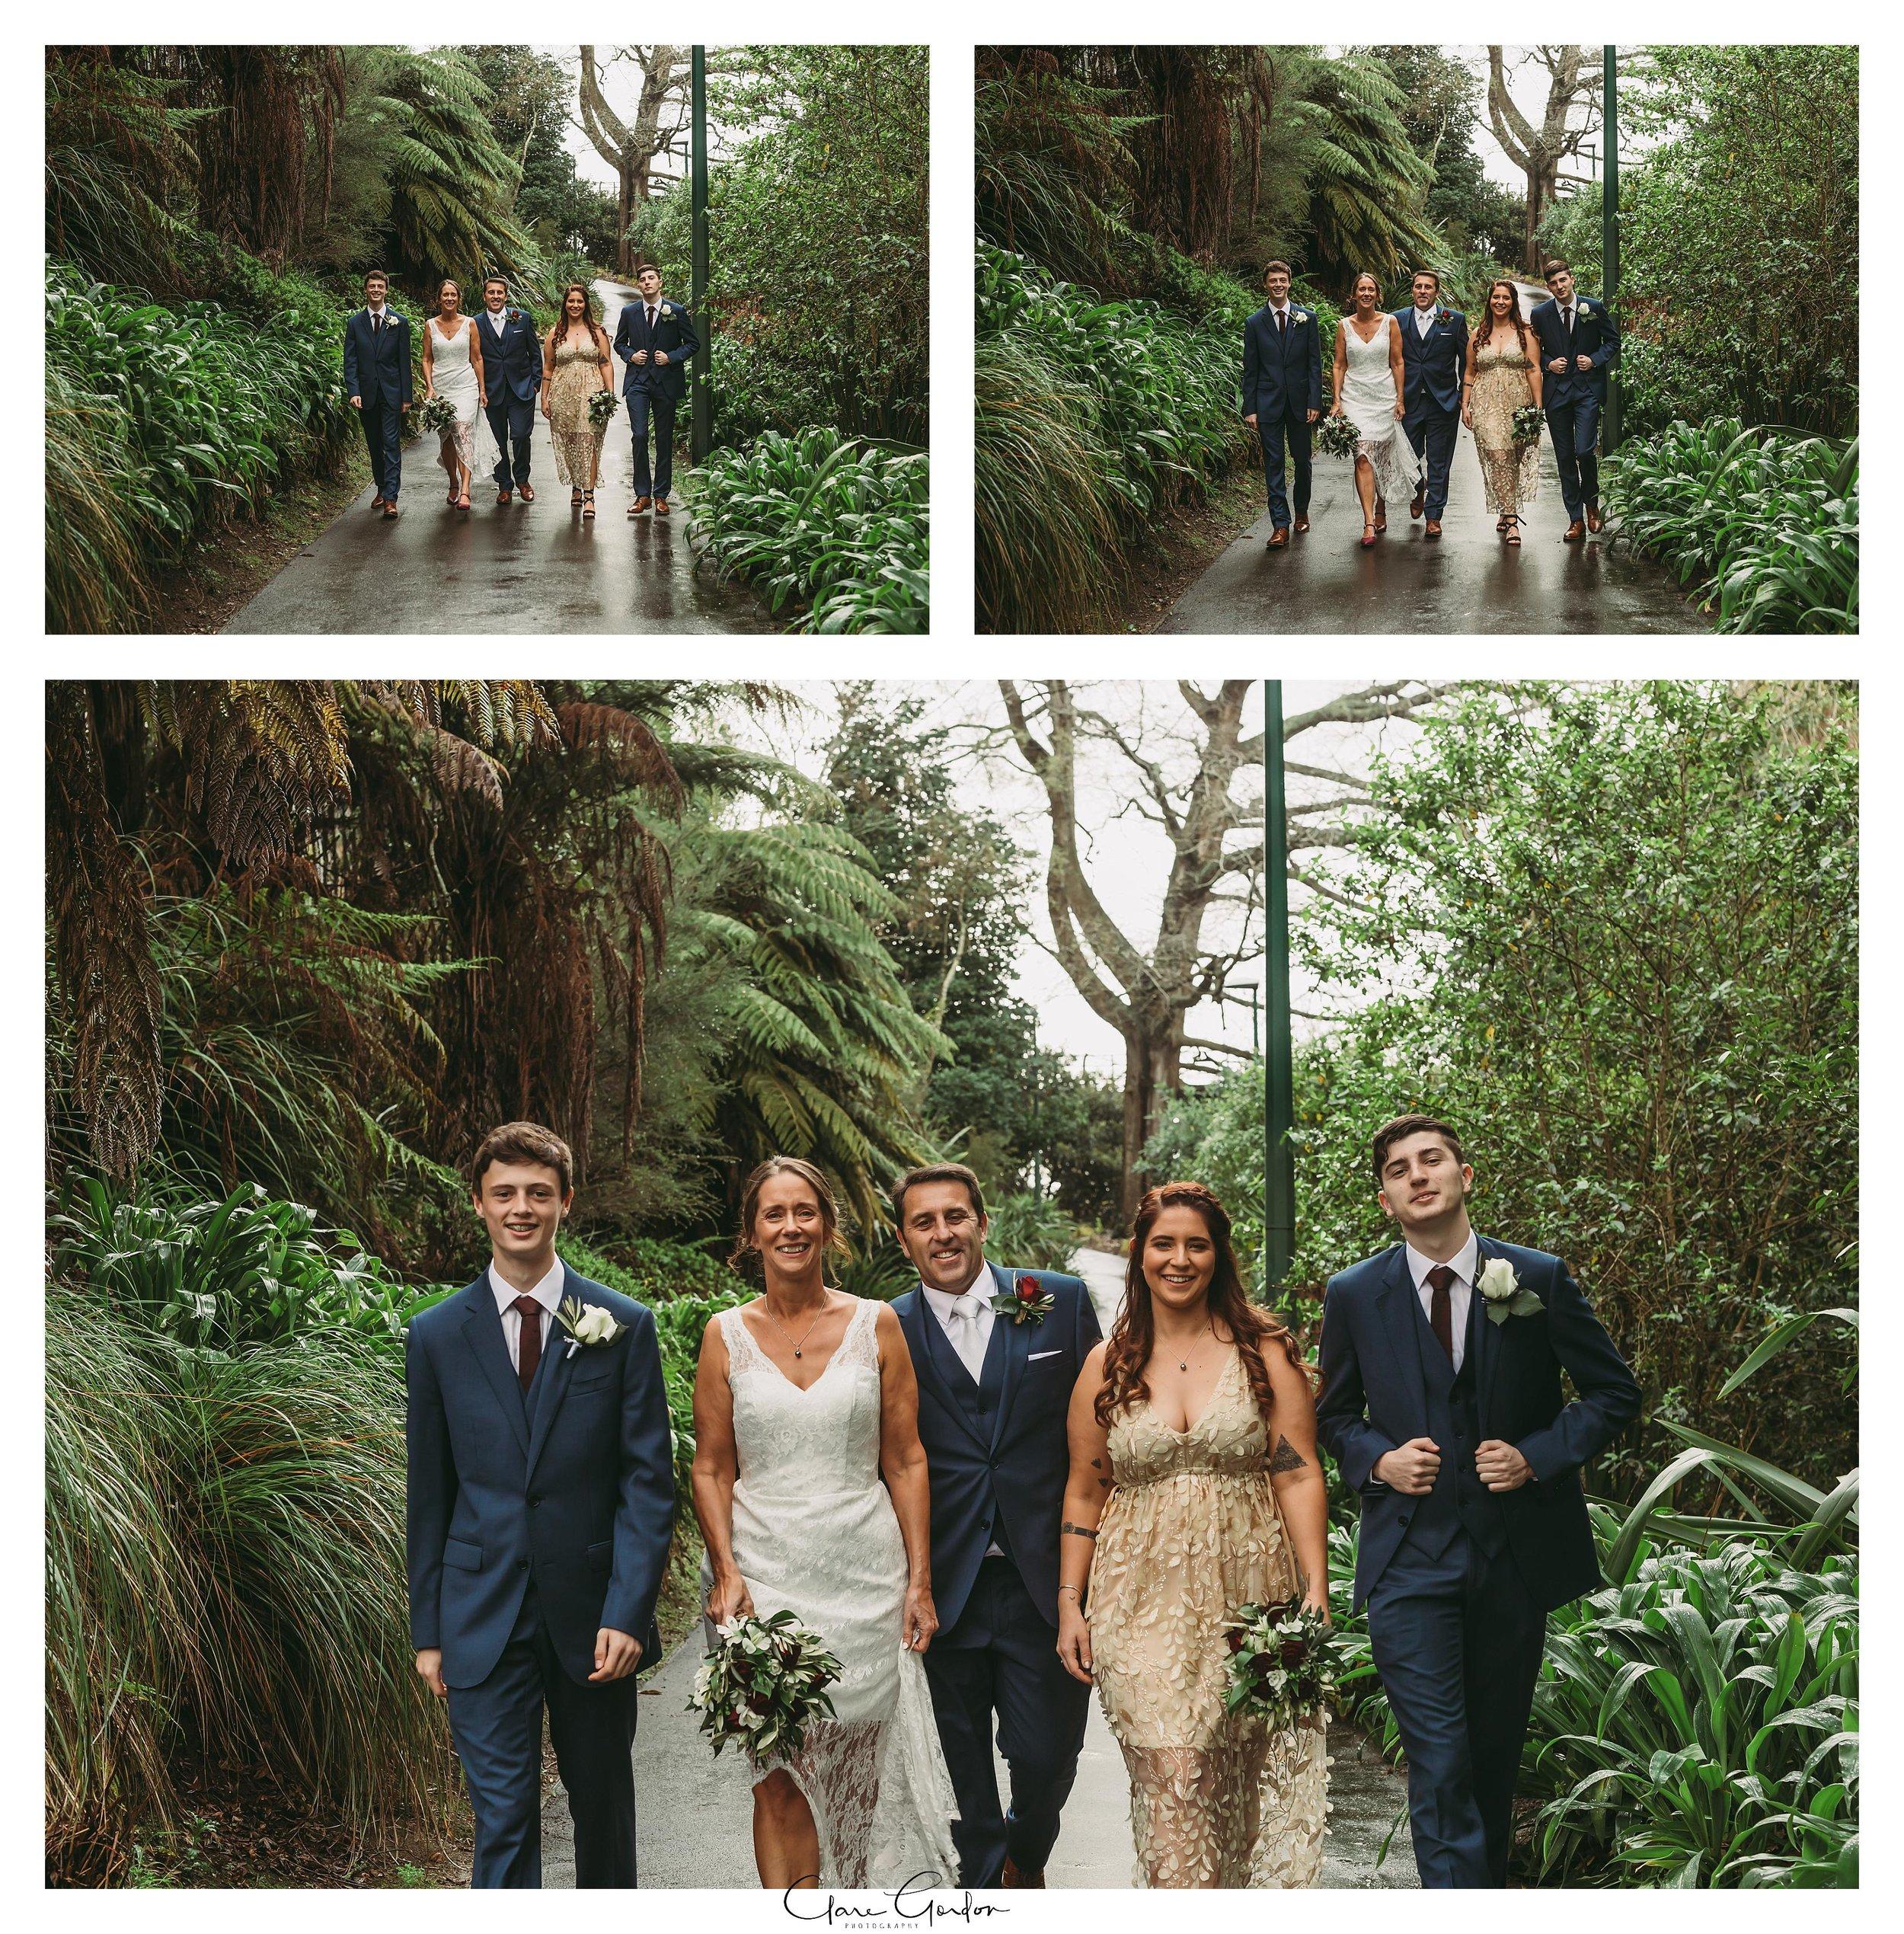 Hamilton-NZ-wedding-photographer-Bride-reflection-Waikato-wedding-photographer-Novotel-Hamilton-Clare-Gordon-photography (15).jpg